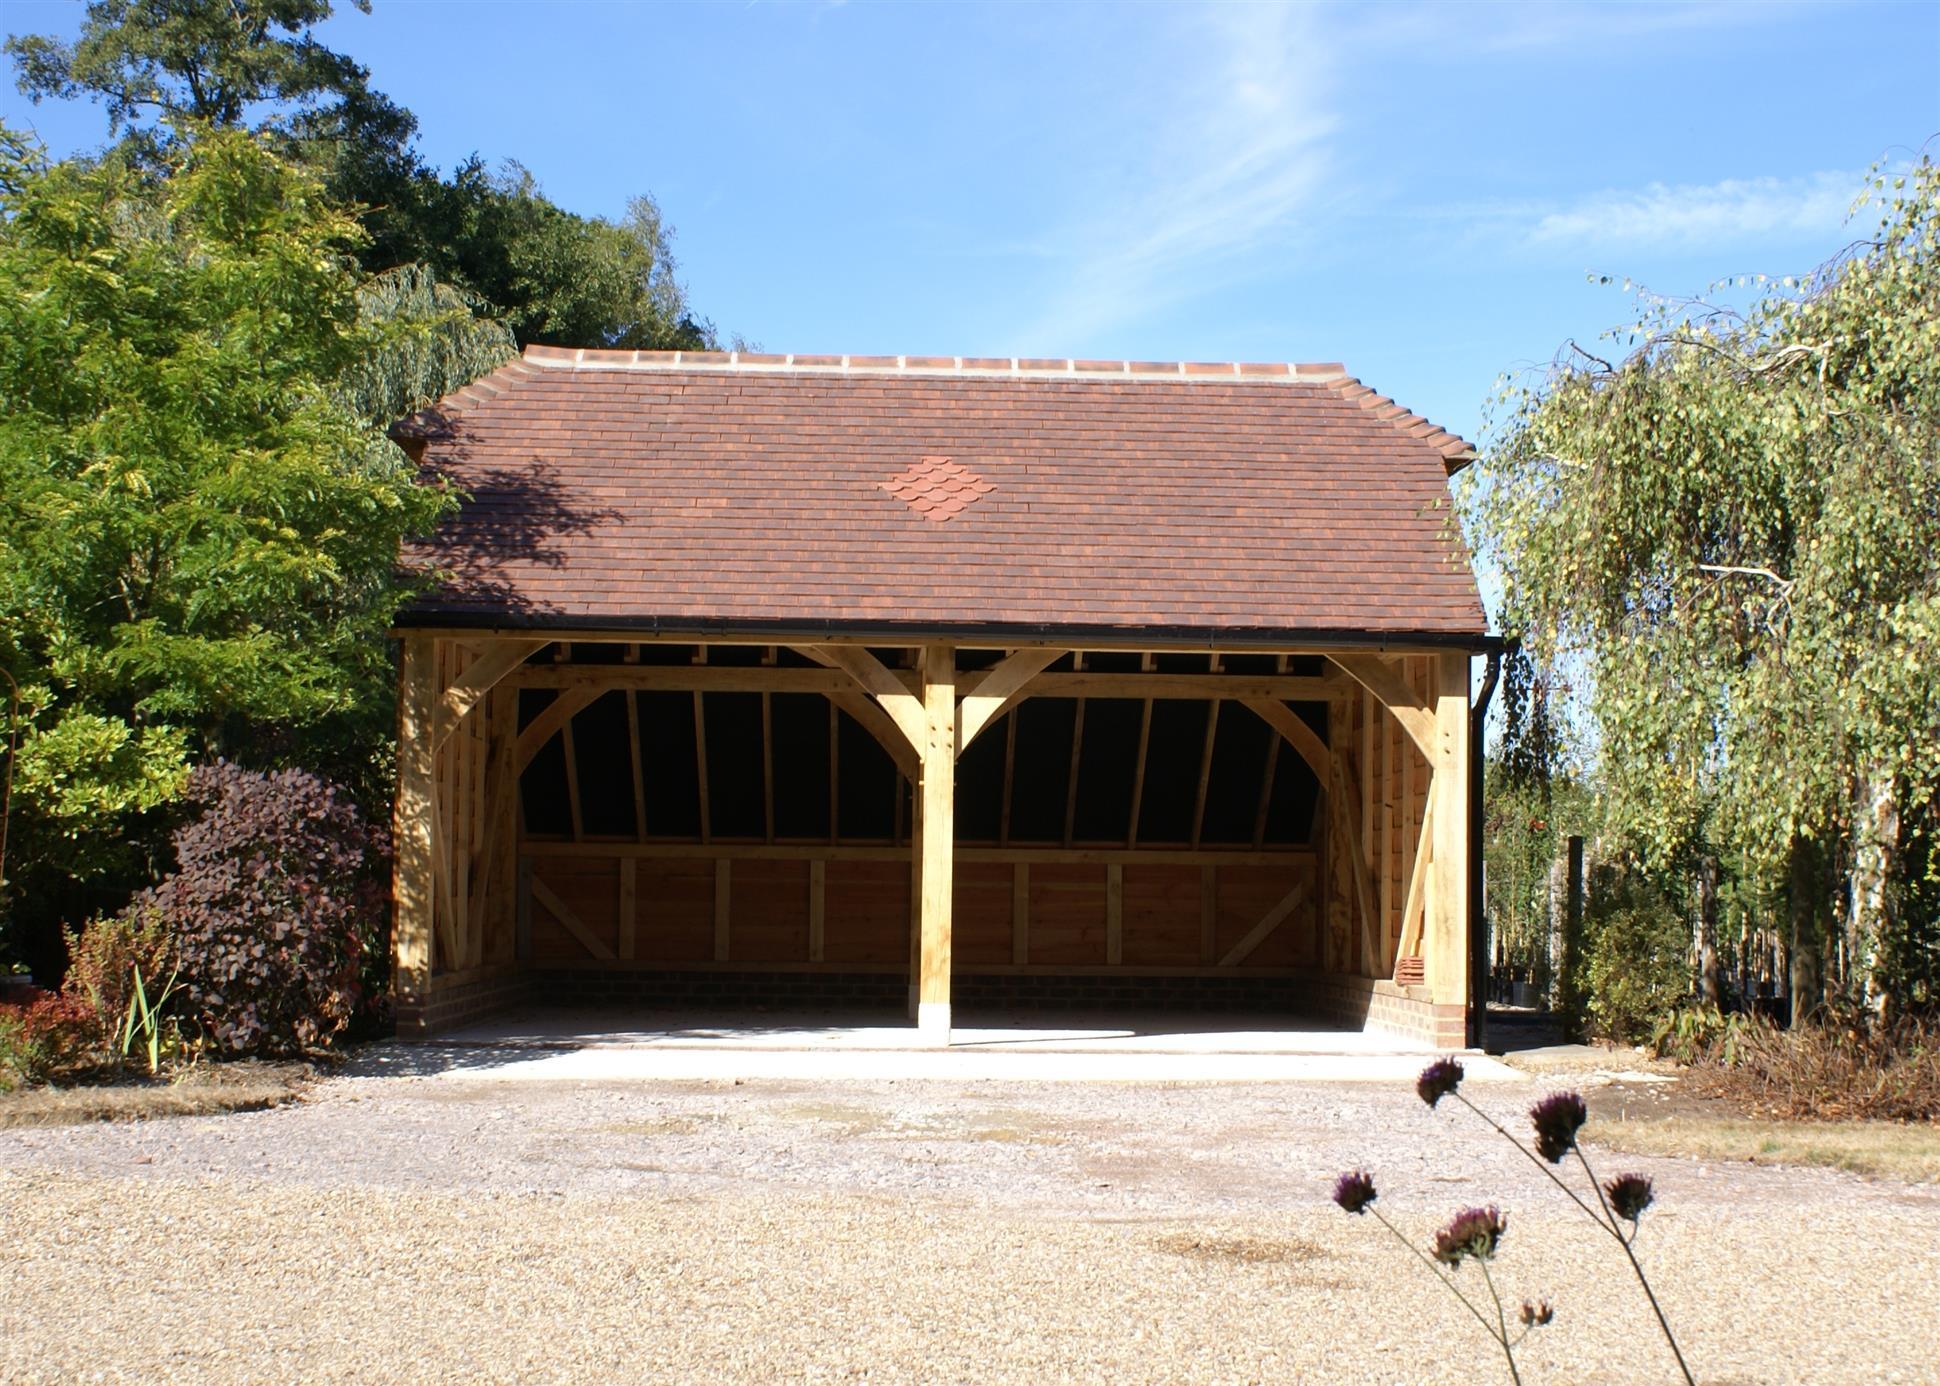 2 Bay Garage Catslide Barn Hip Roof